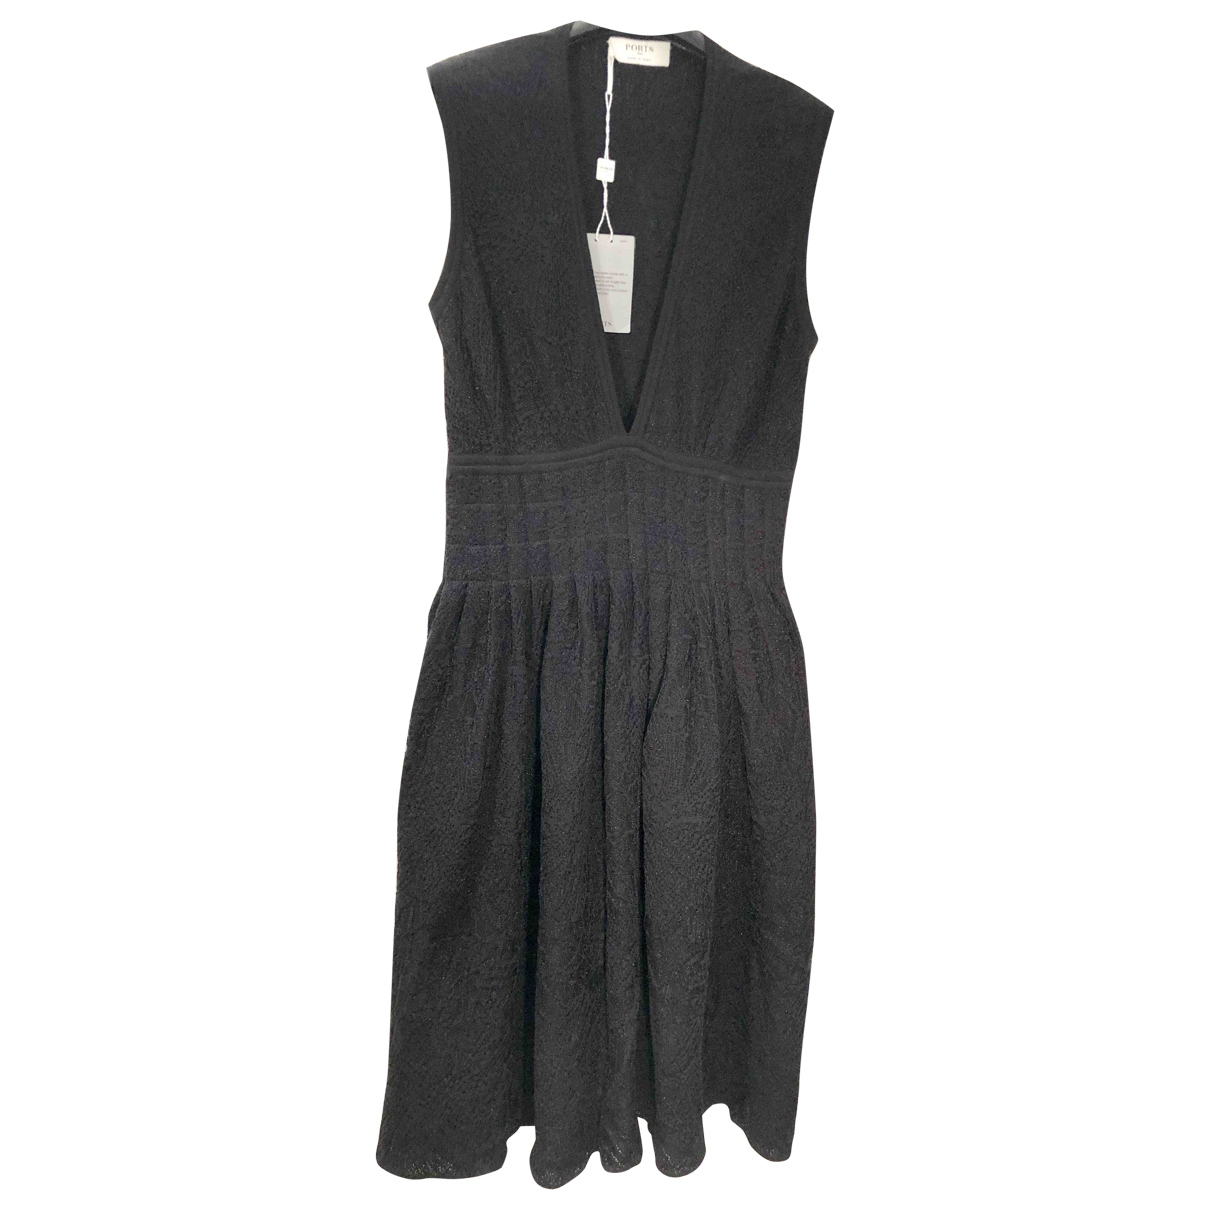 Ports 1961 \N Black Cotton dress for Women L International